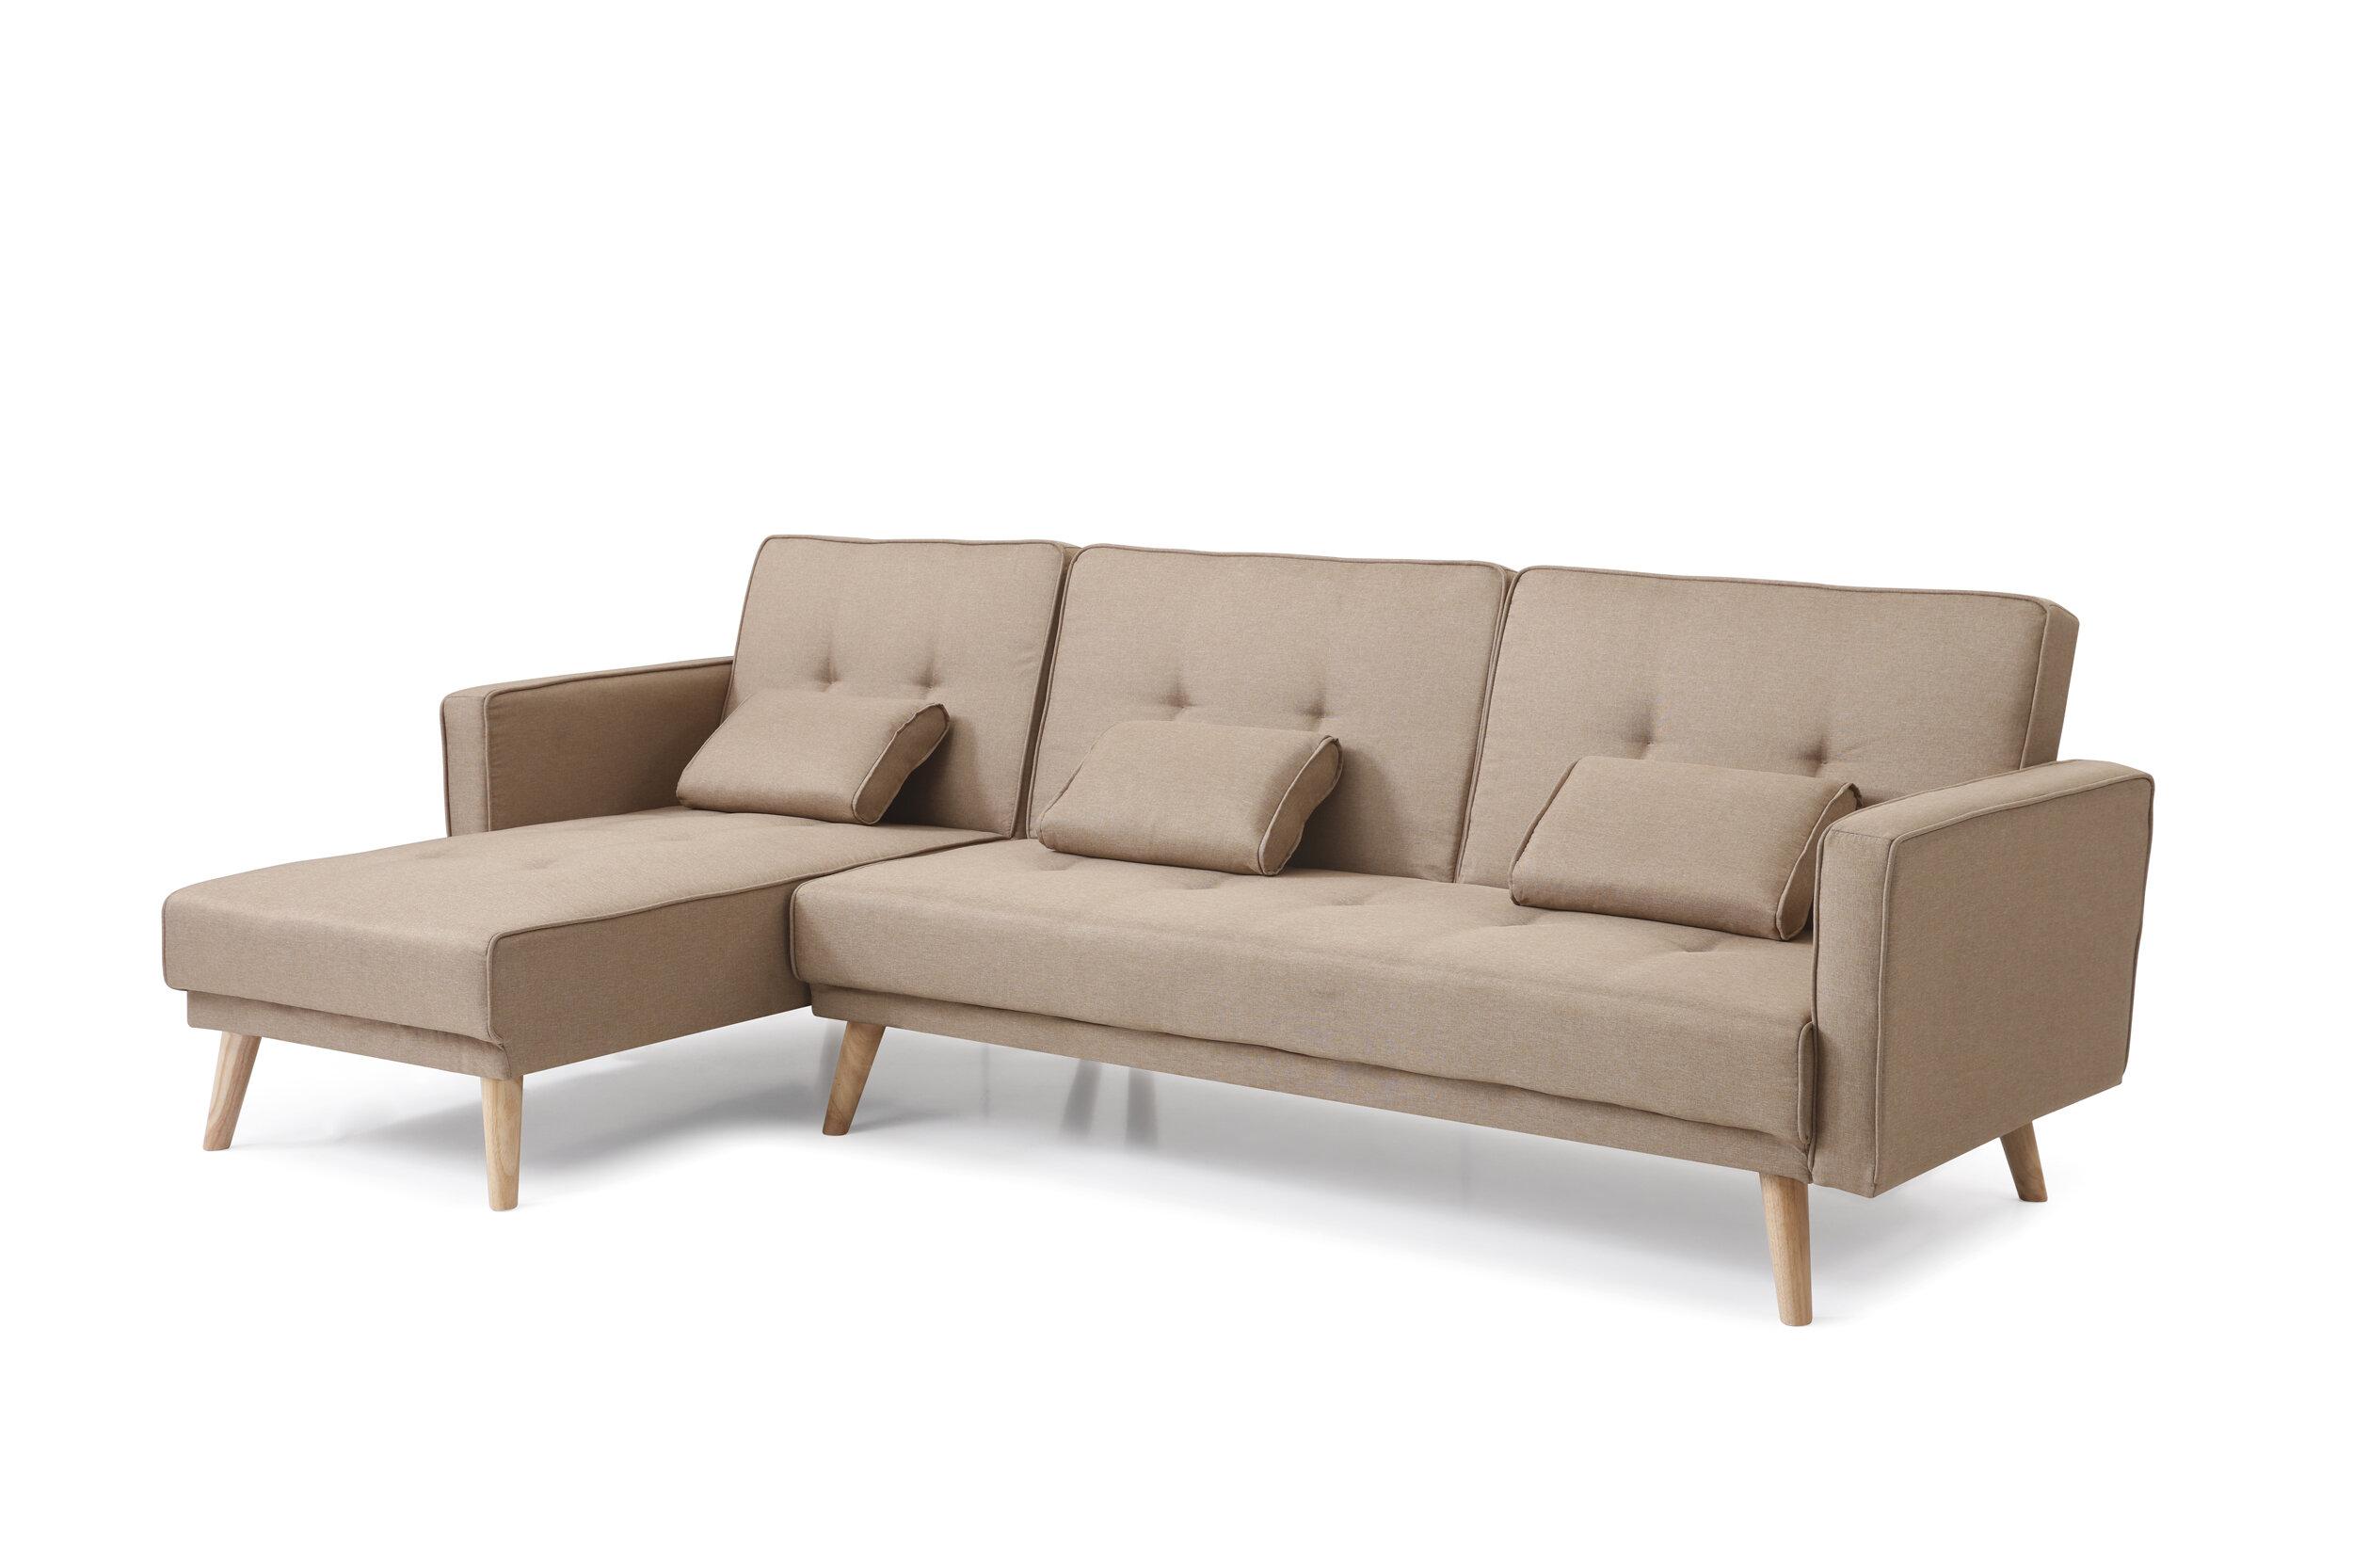 Astonishing Easton Reversible Sleeper Sectional Creativecarmelina Interior Chair Design Creativecarmelinacom